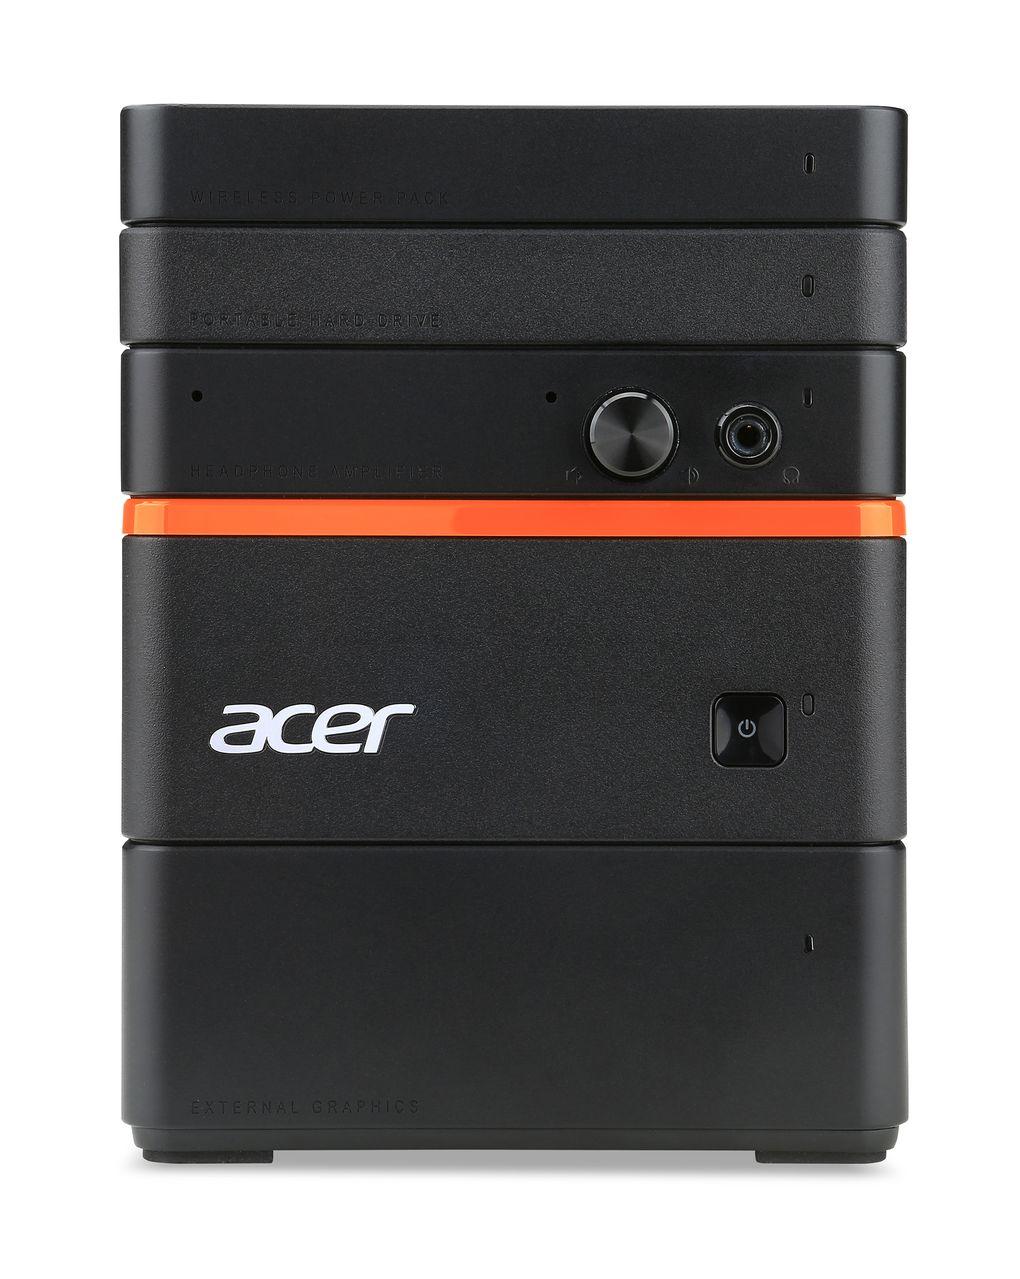 Acer Revo Build Series 600 03